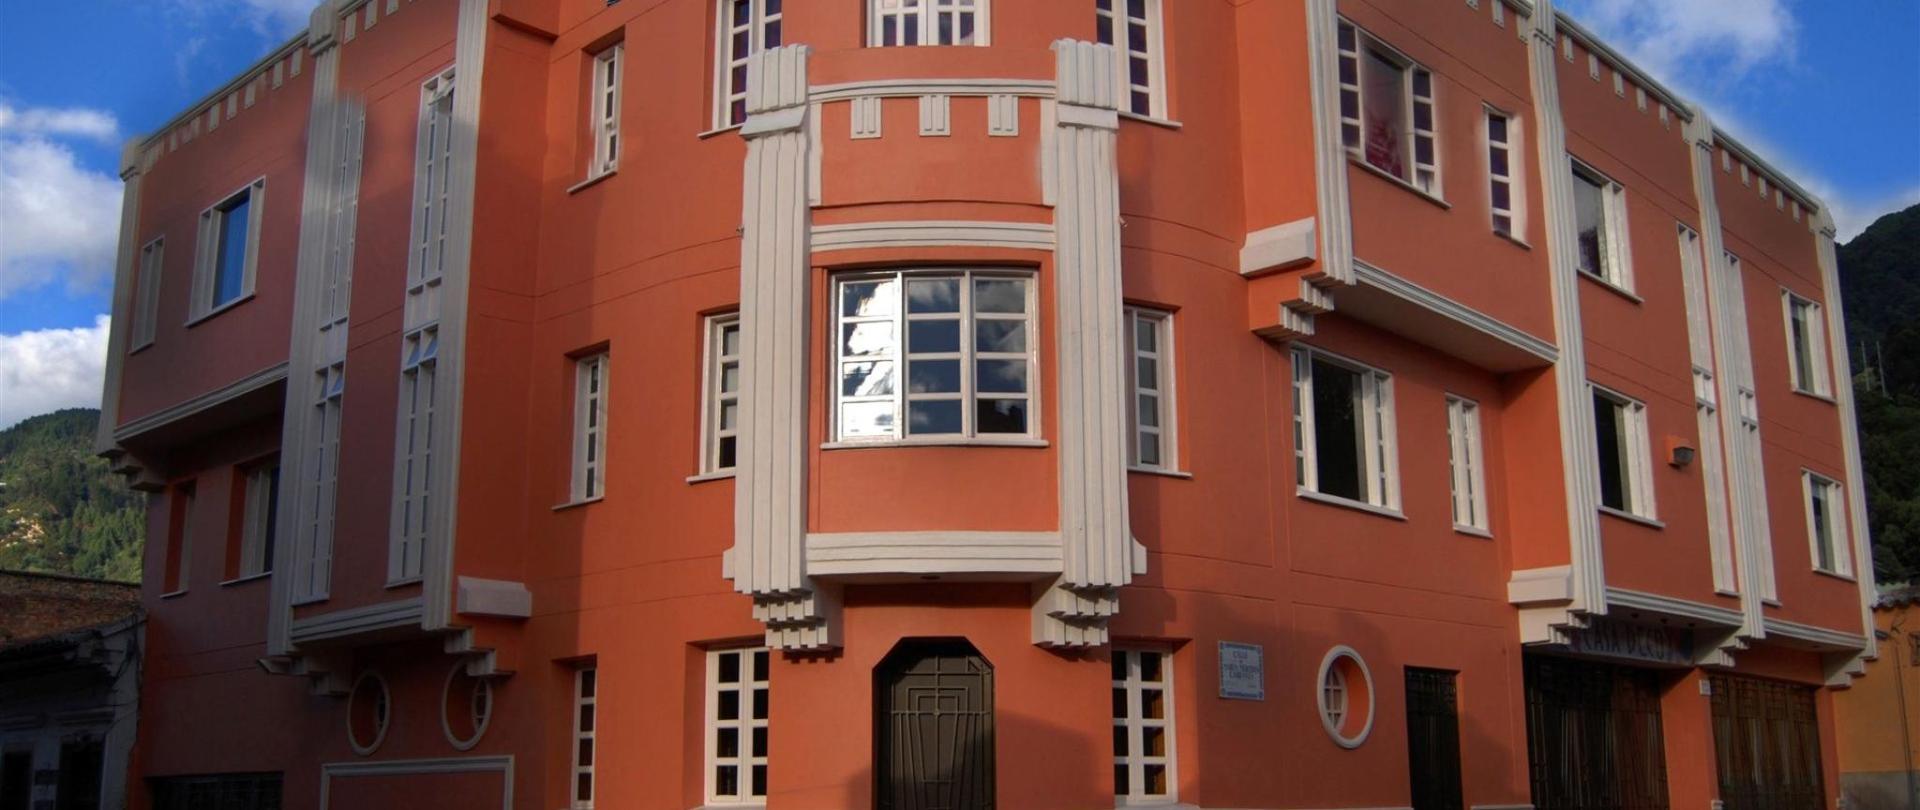 Hotel Casa Deco.jpg